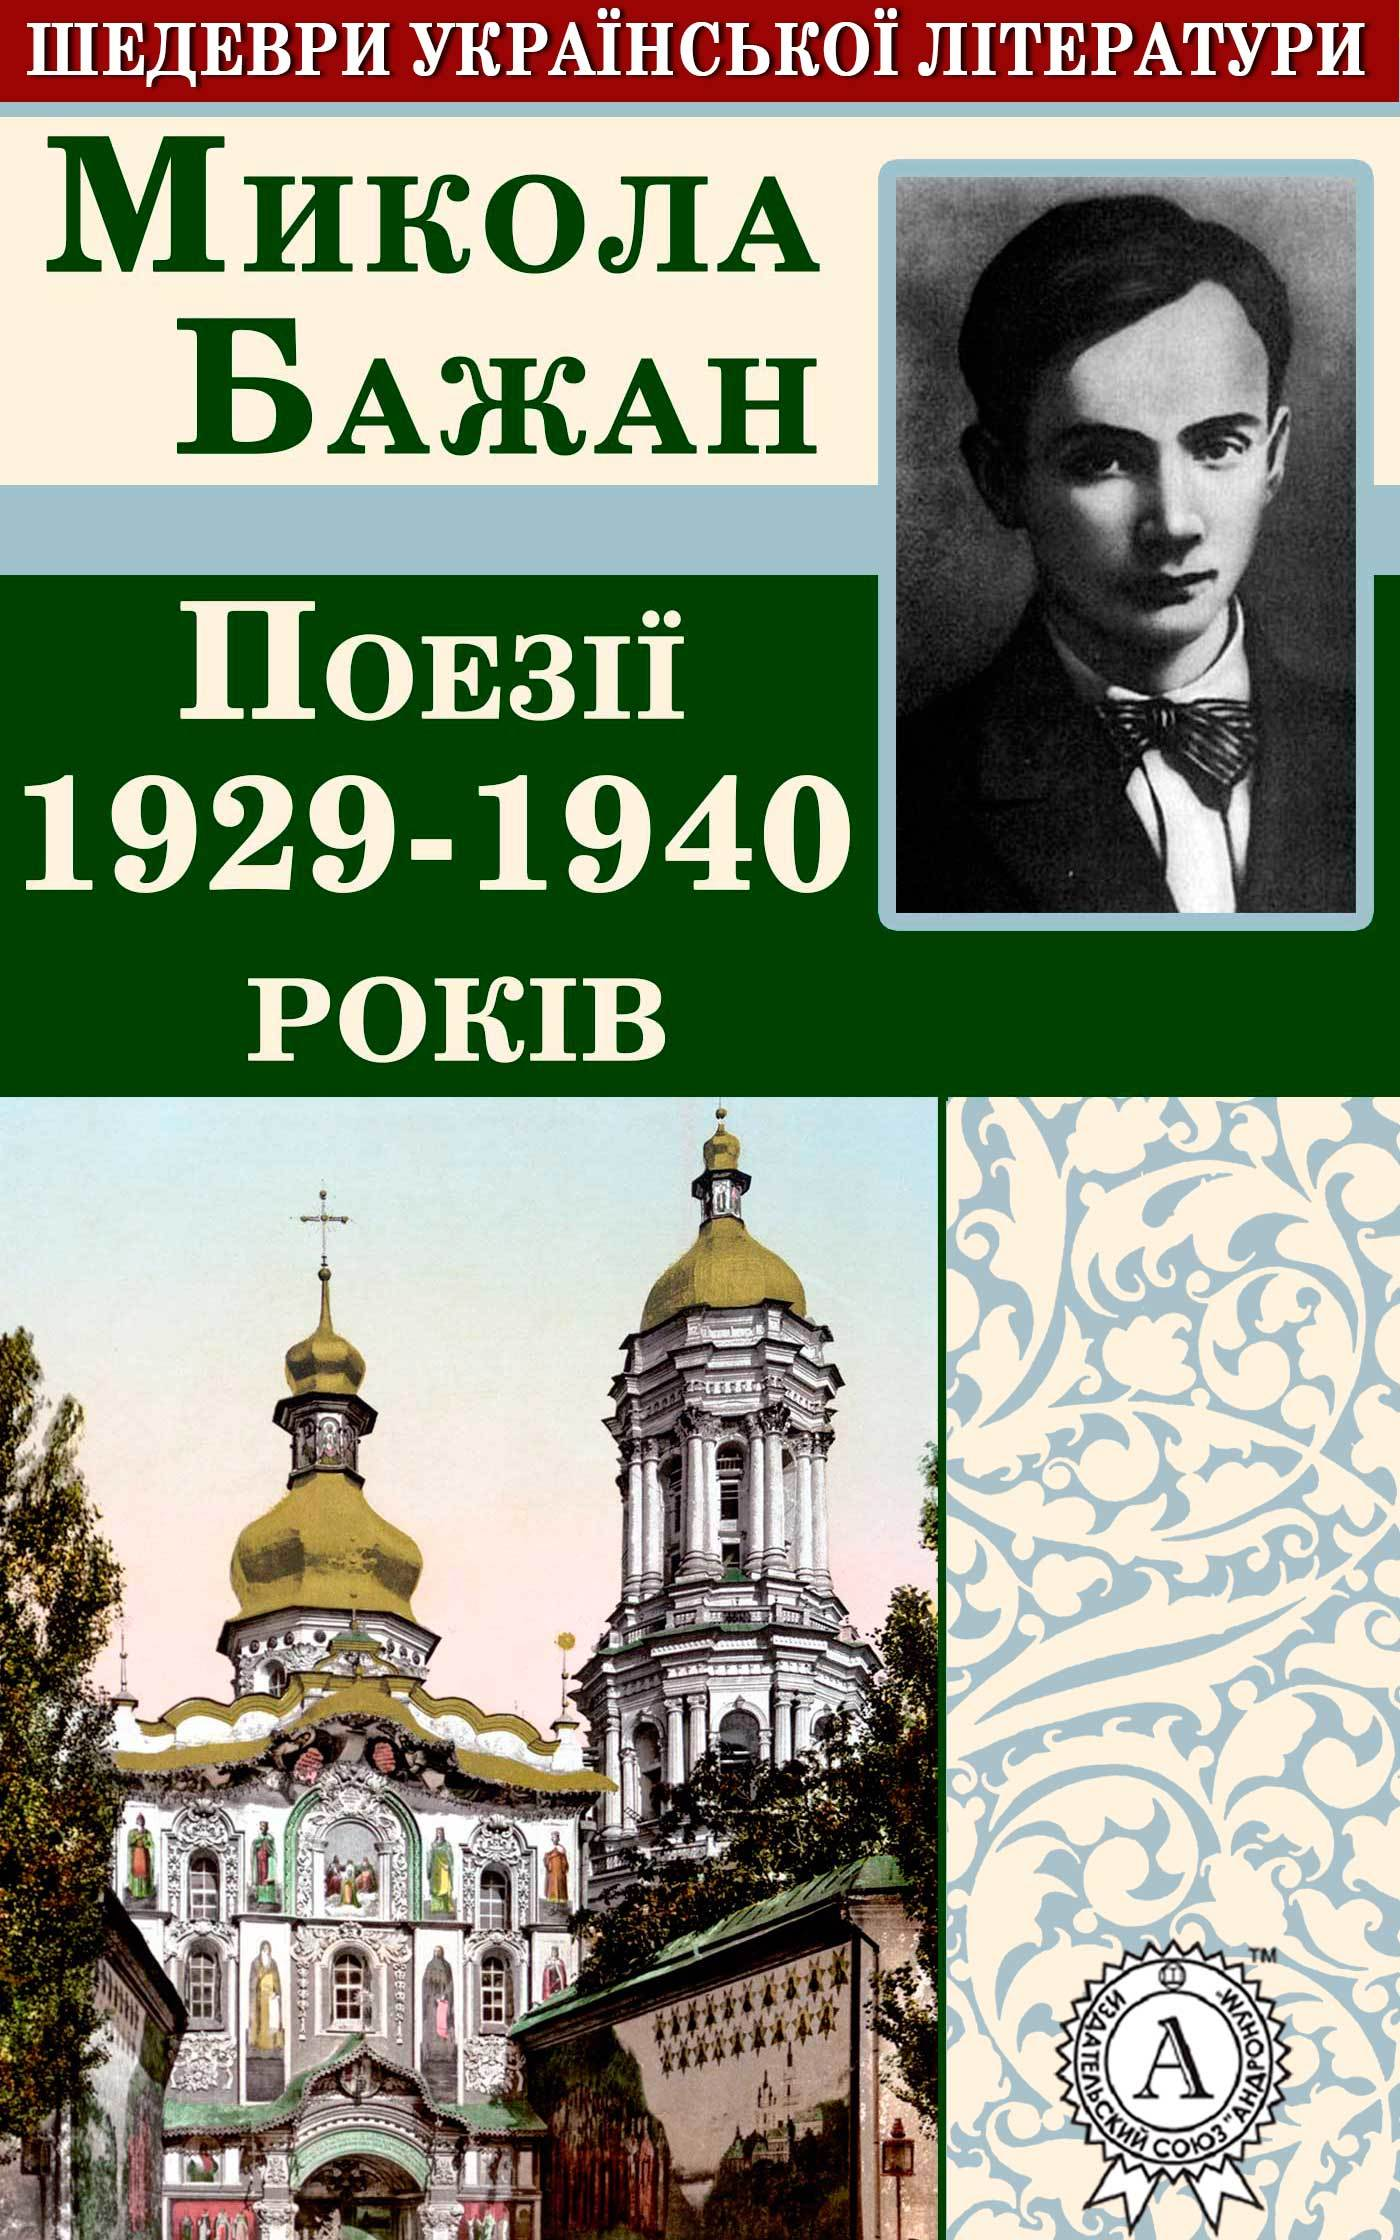 интригующее повествование в книге Микола Бажан